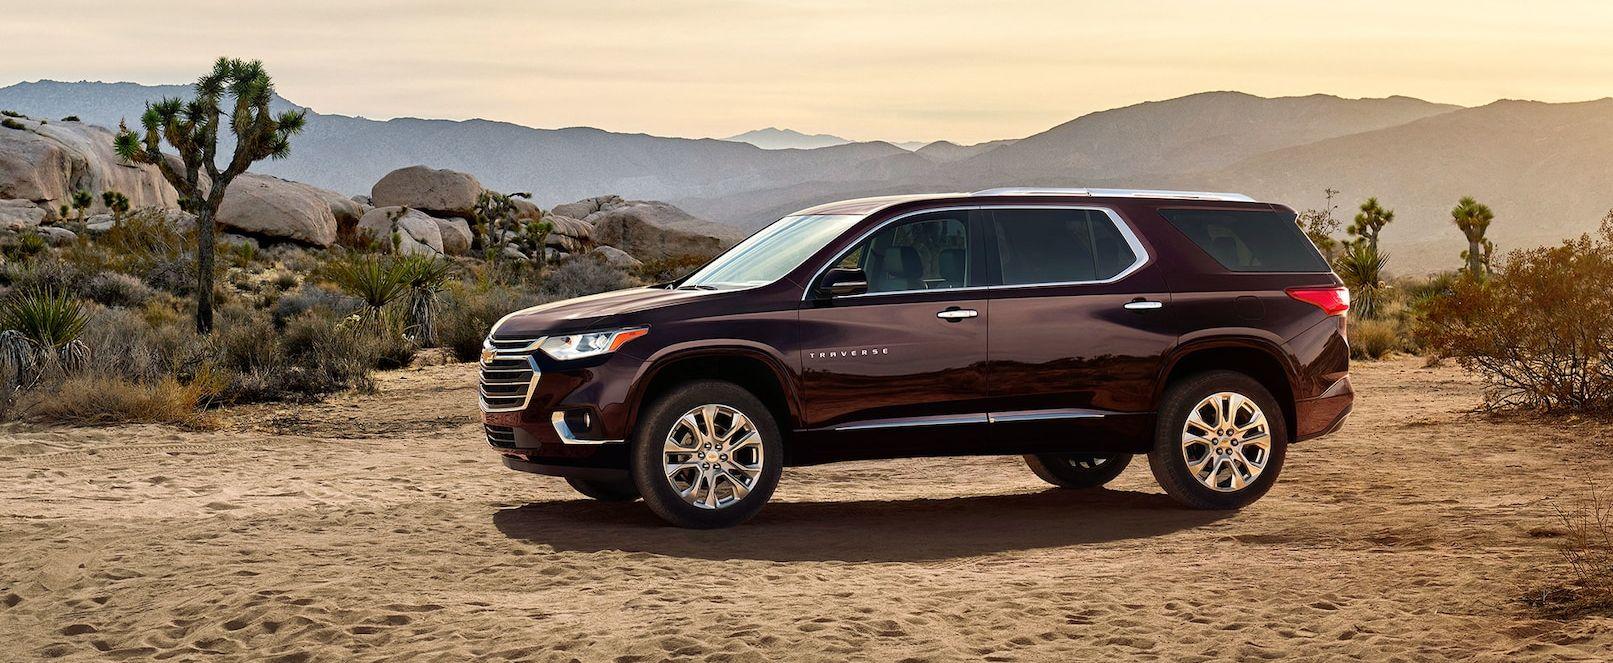 2019 Chevrolet Traverse for Sale near Escondido, CA